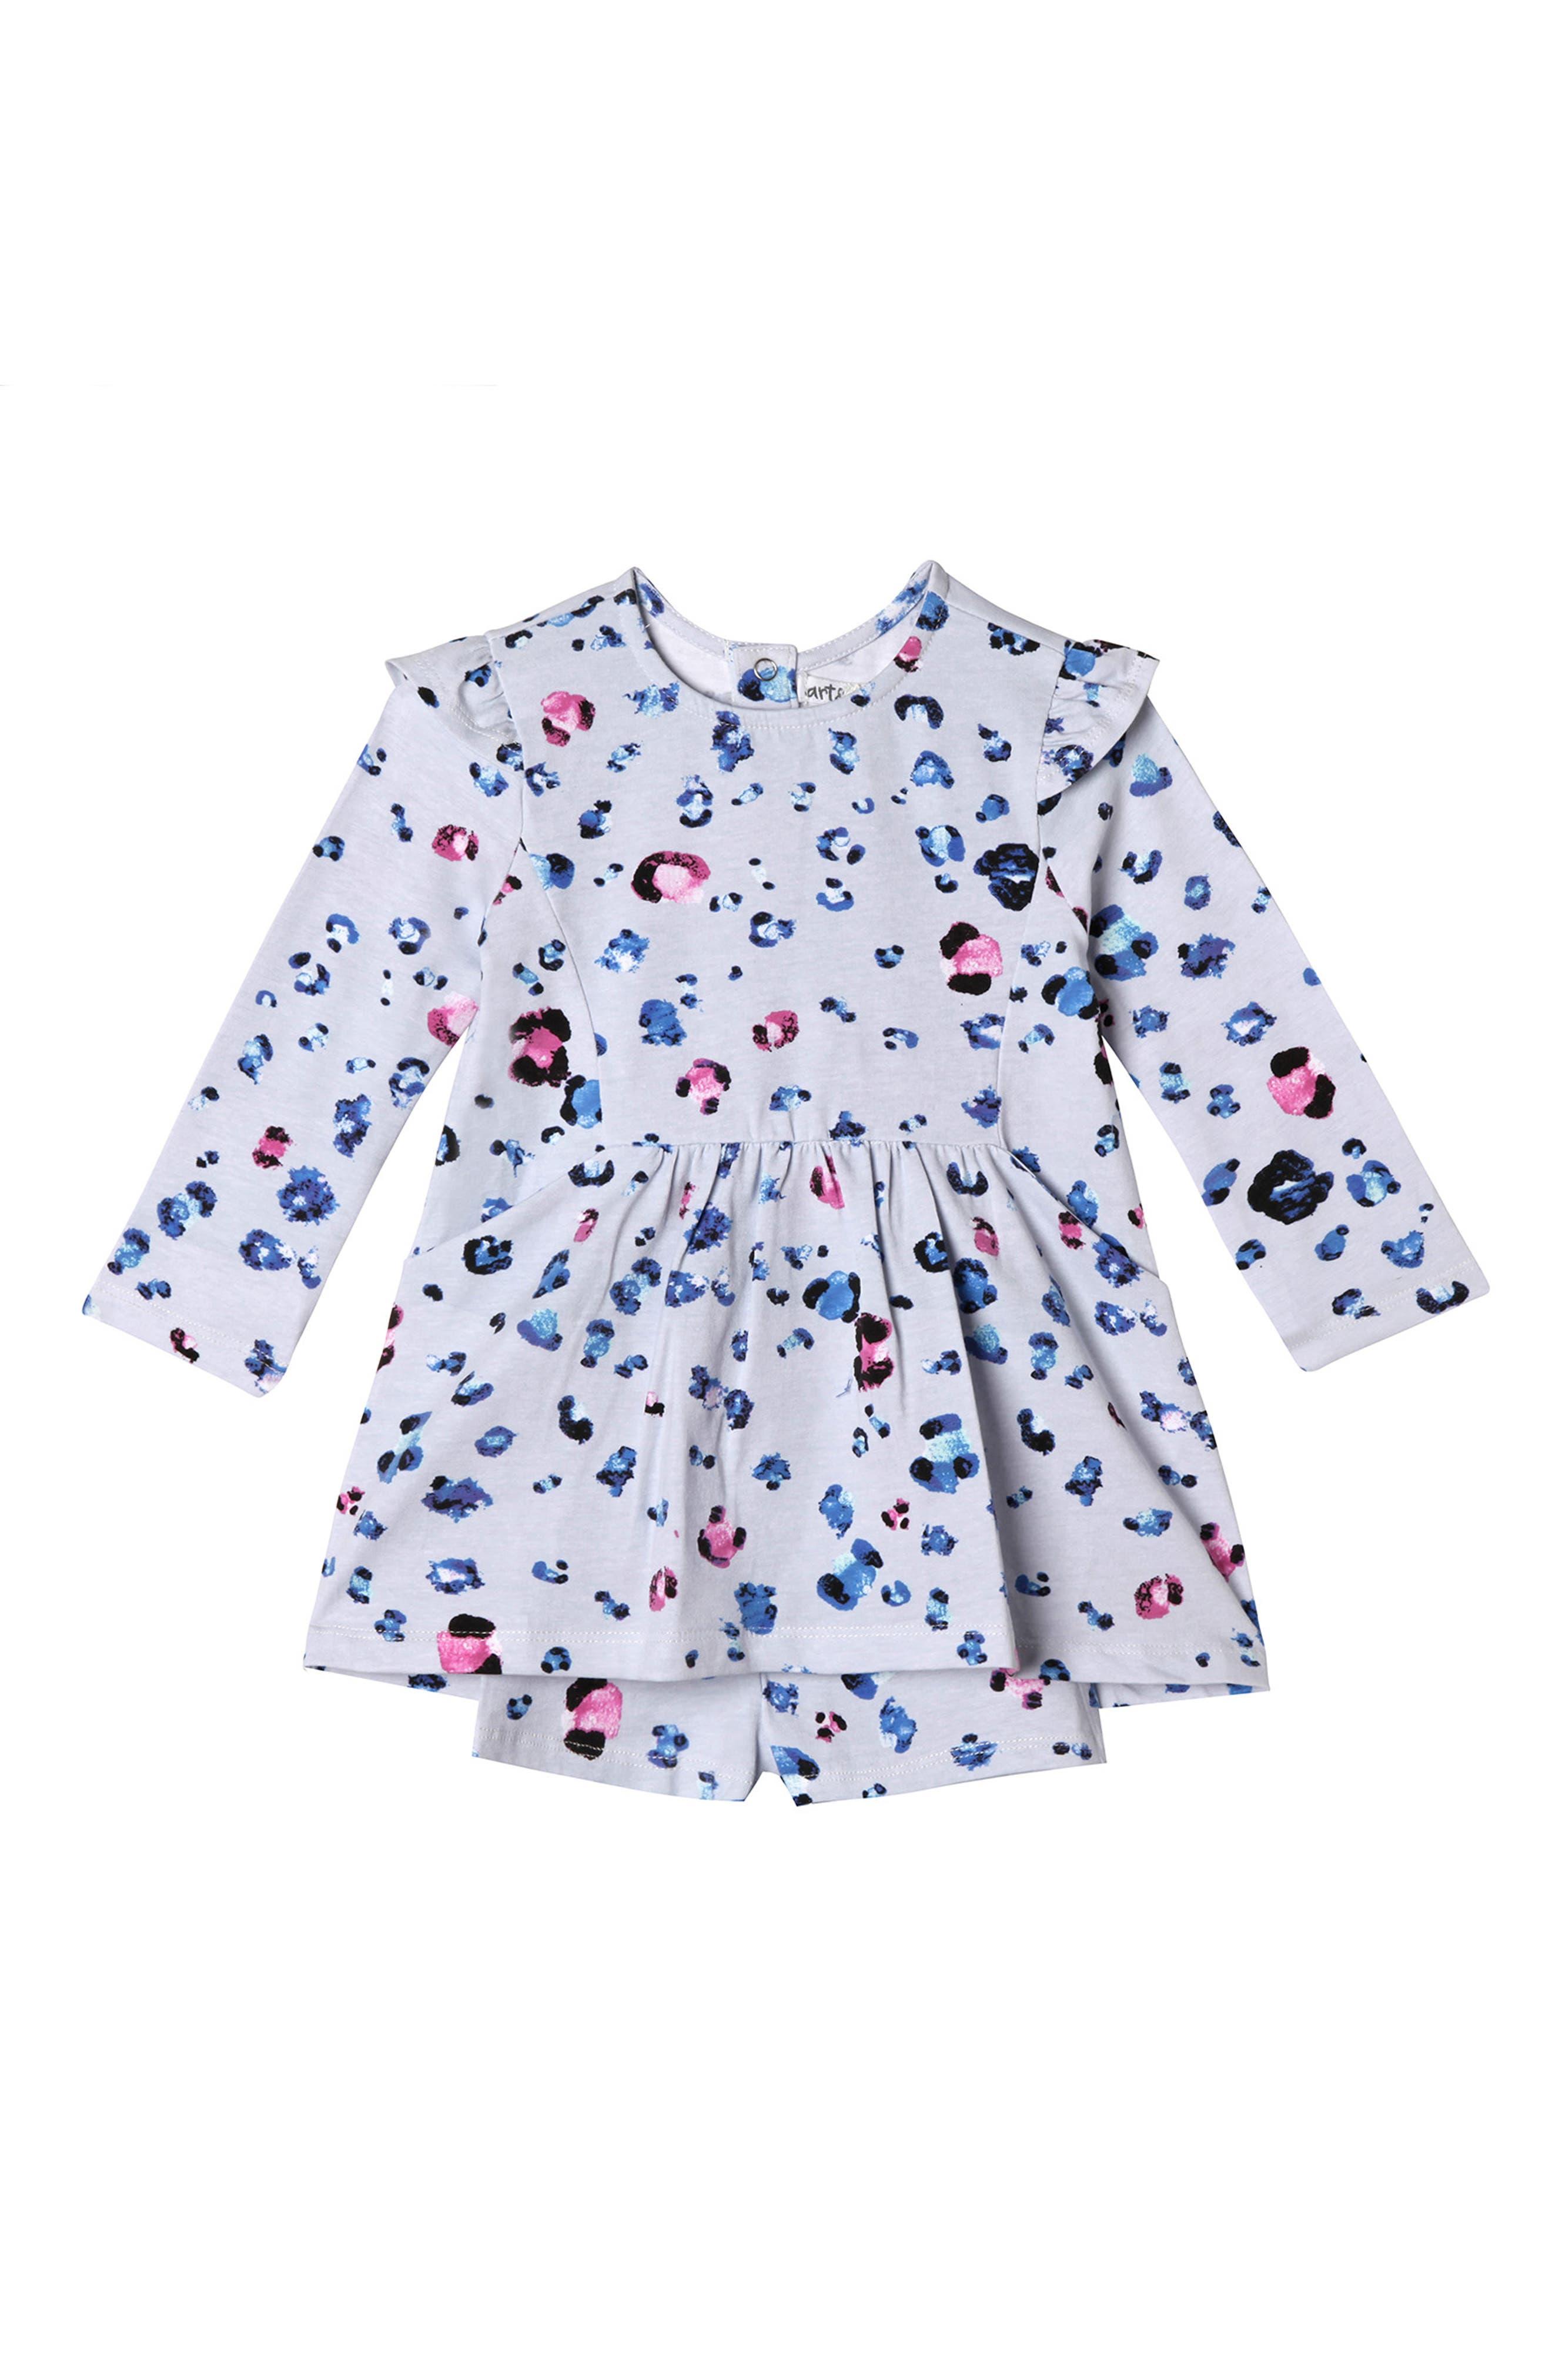 Leah Spot Dress & Shorts Set,                         Main,                         color, Spot